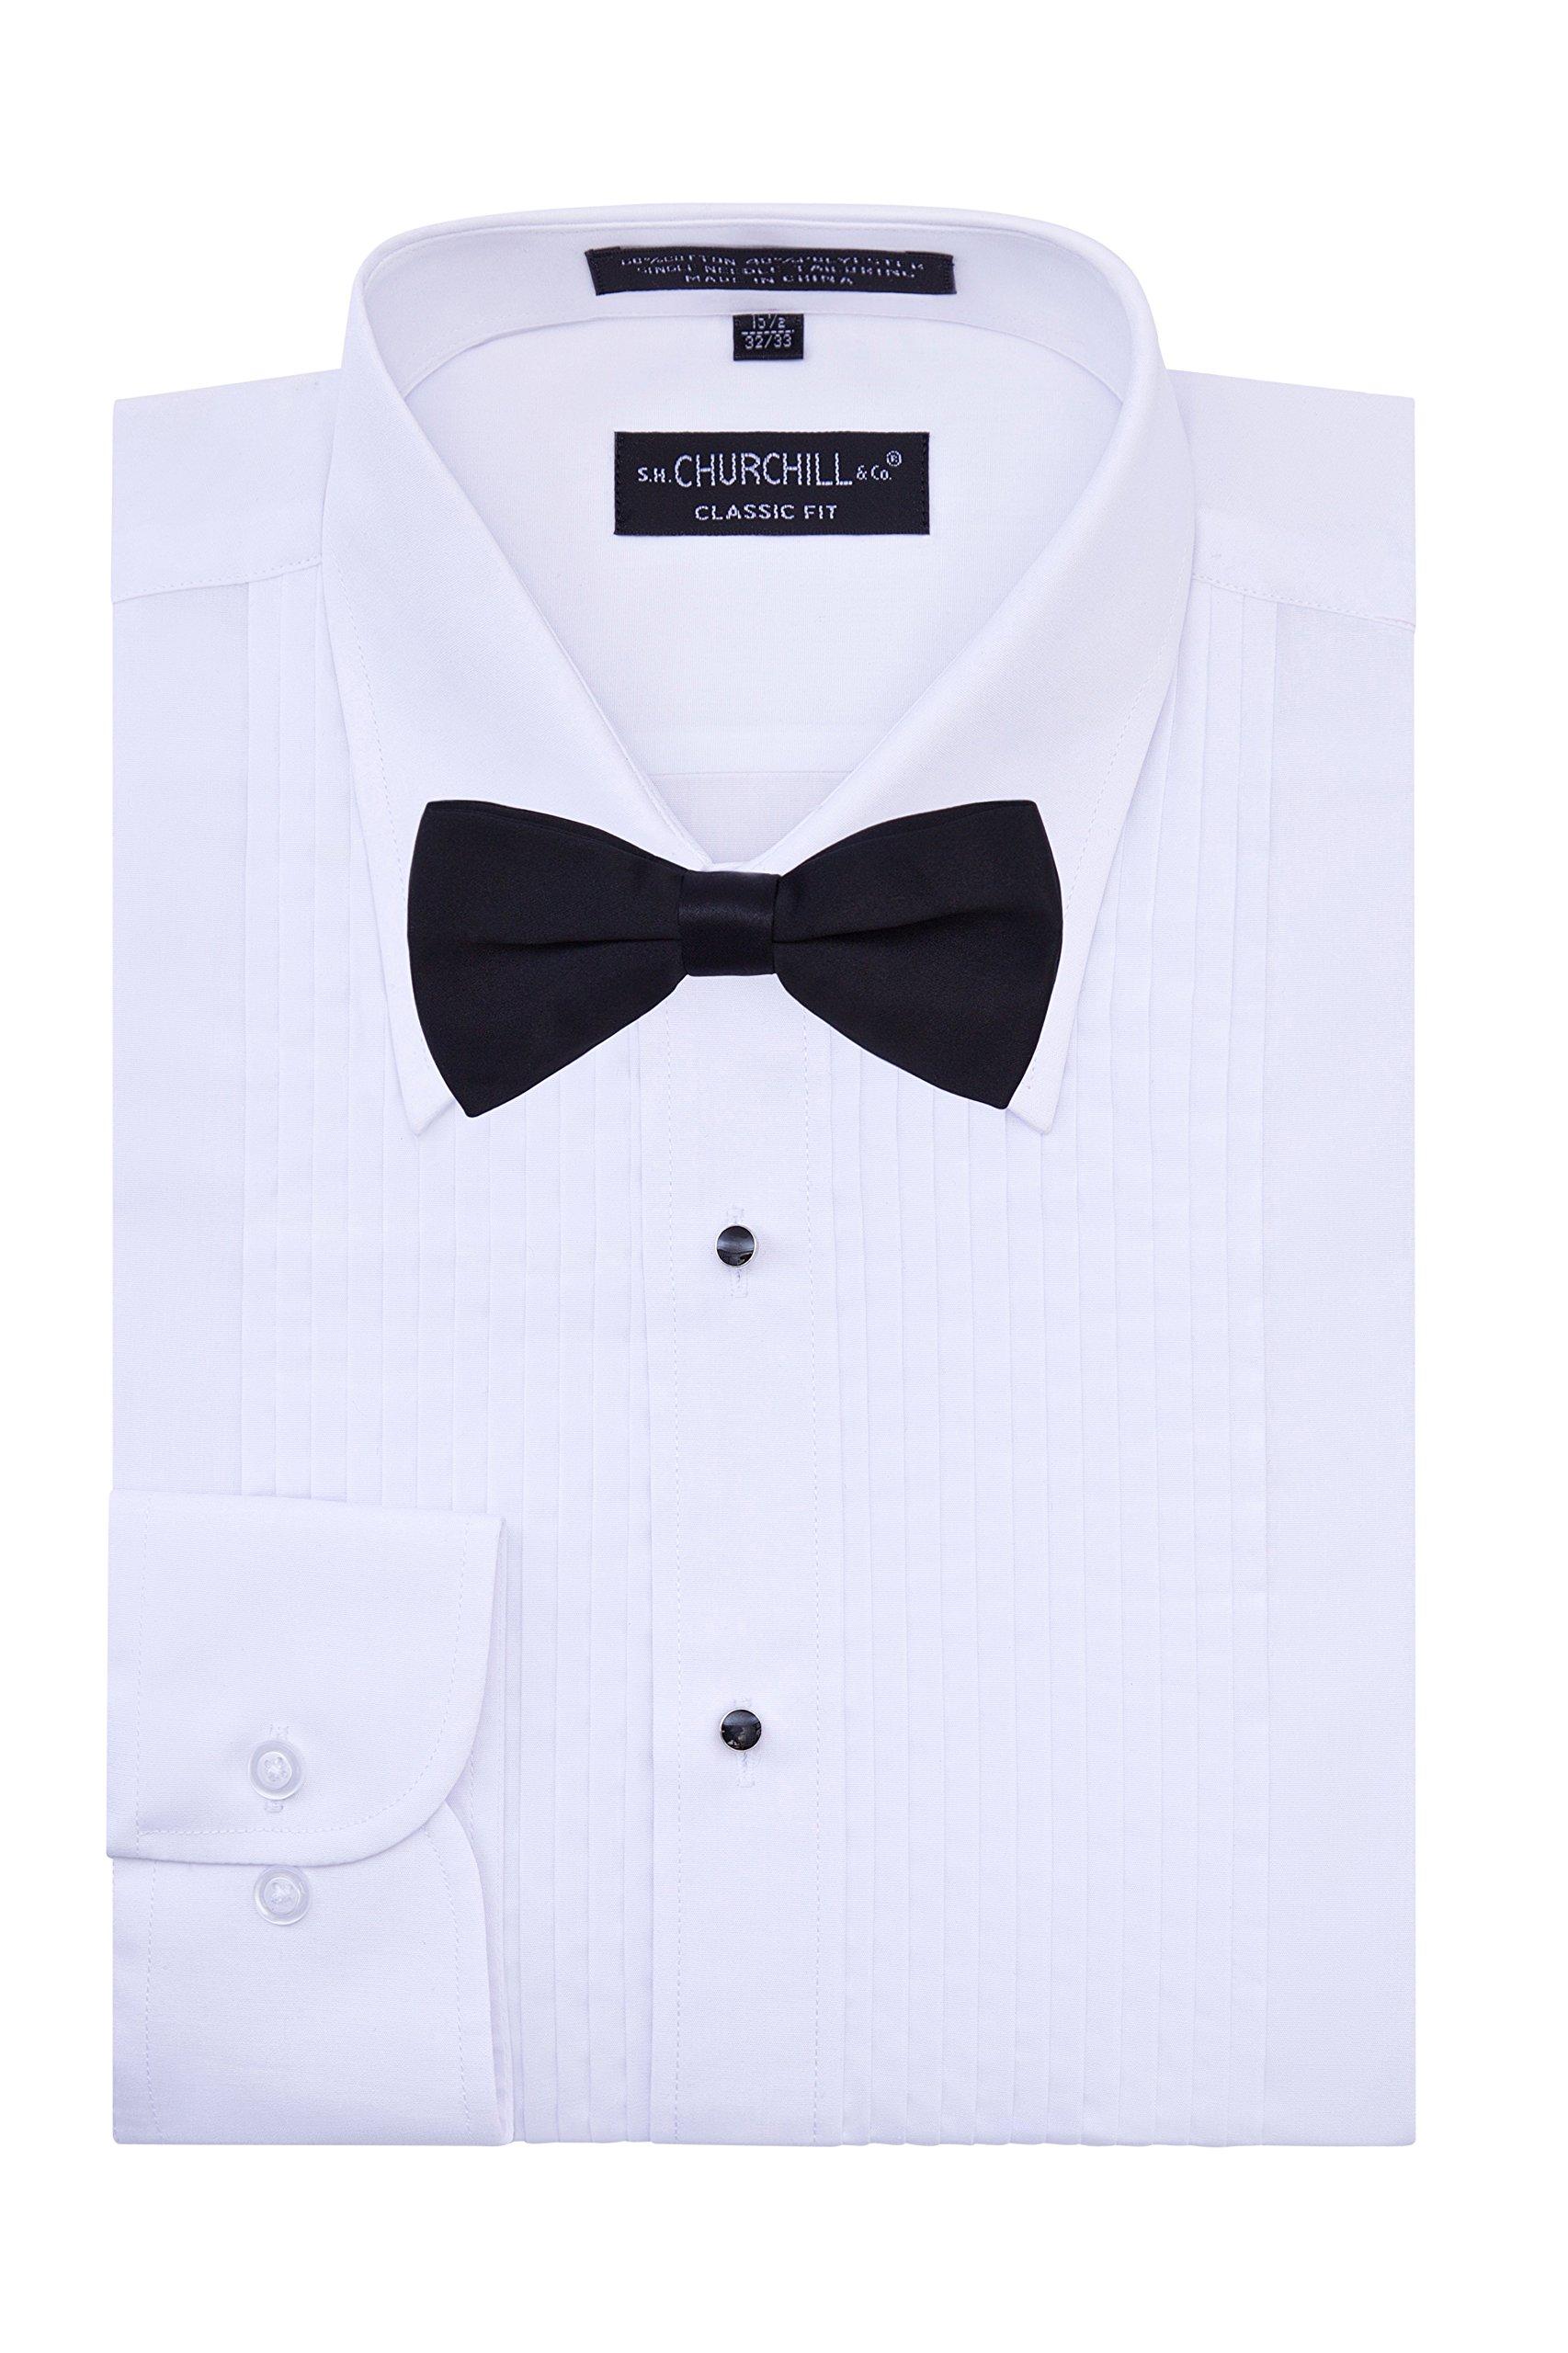 S.H. Churchill & Co. Men's Tuxedo Shirt with Black Bow Tie - Laydown Collar - Medium 34/35